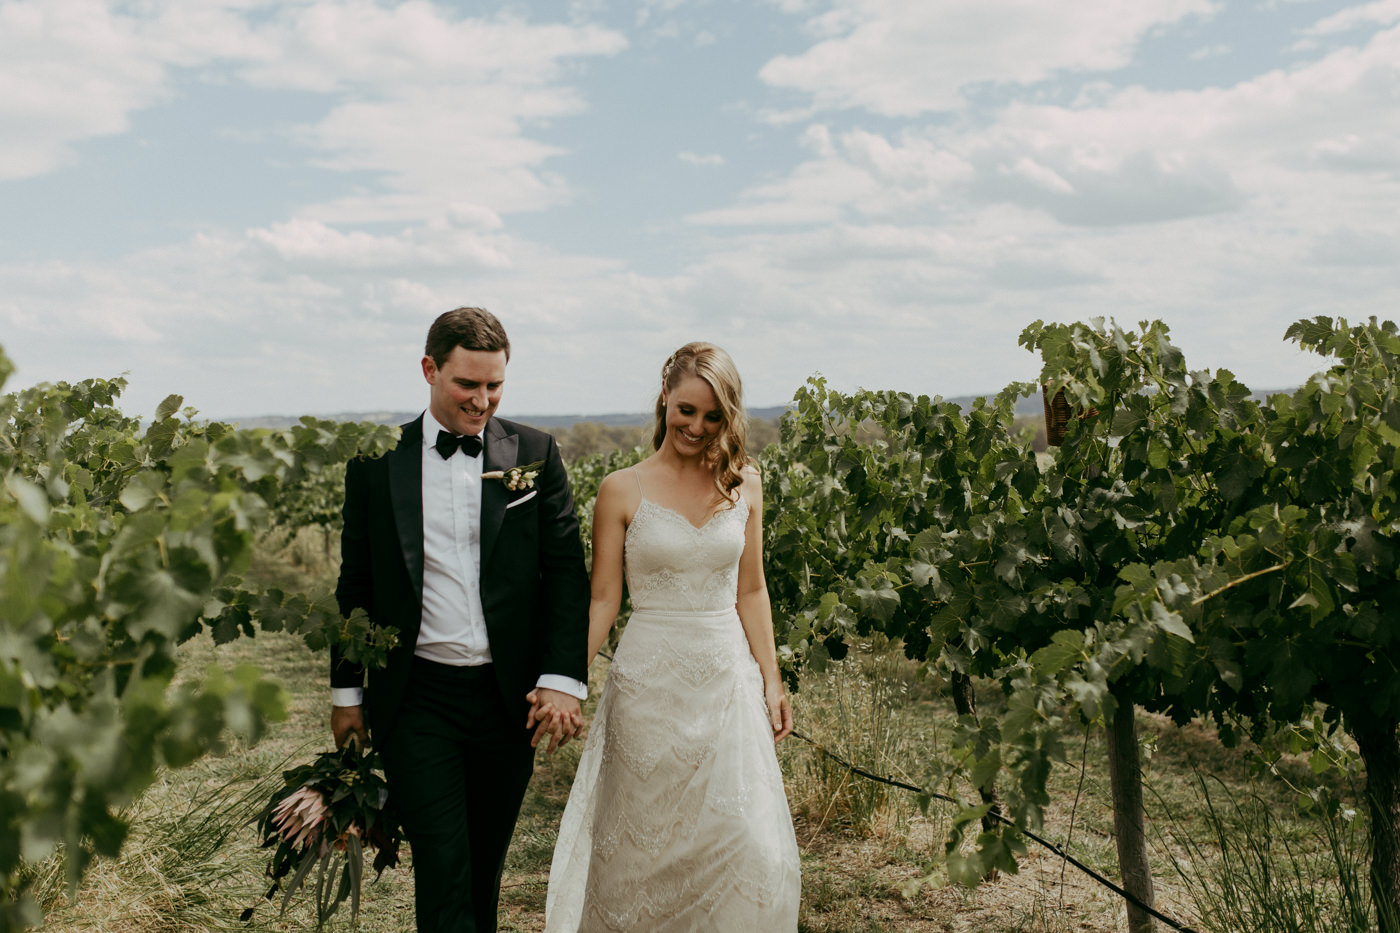 Anthony & Eliet - Wagga Wagga Wedding - Country NSW - Samantha Heather Photography-72.jpg